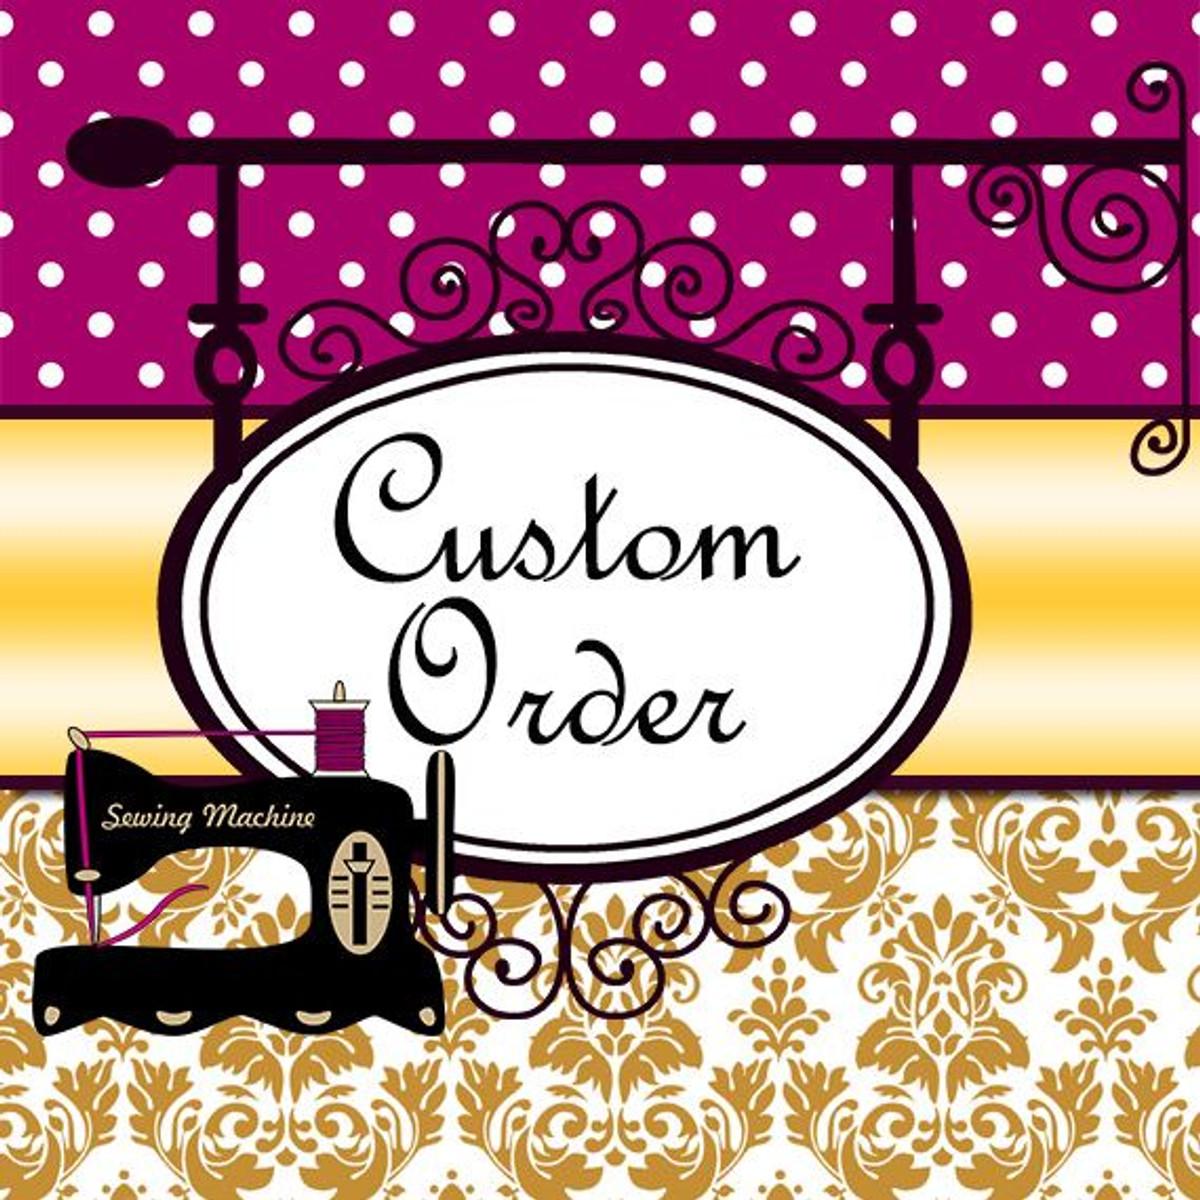 Custom Wedding Dress for Kelli G